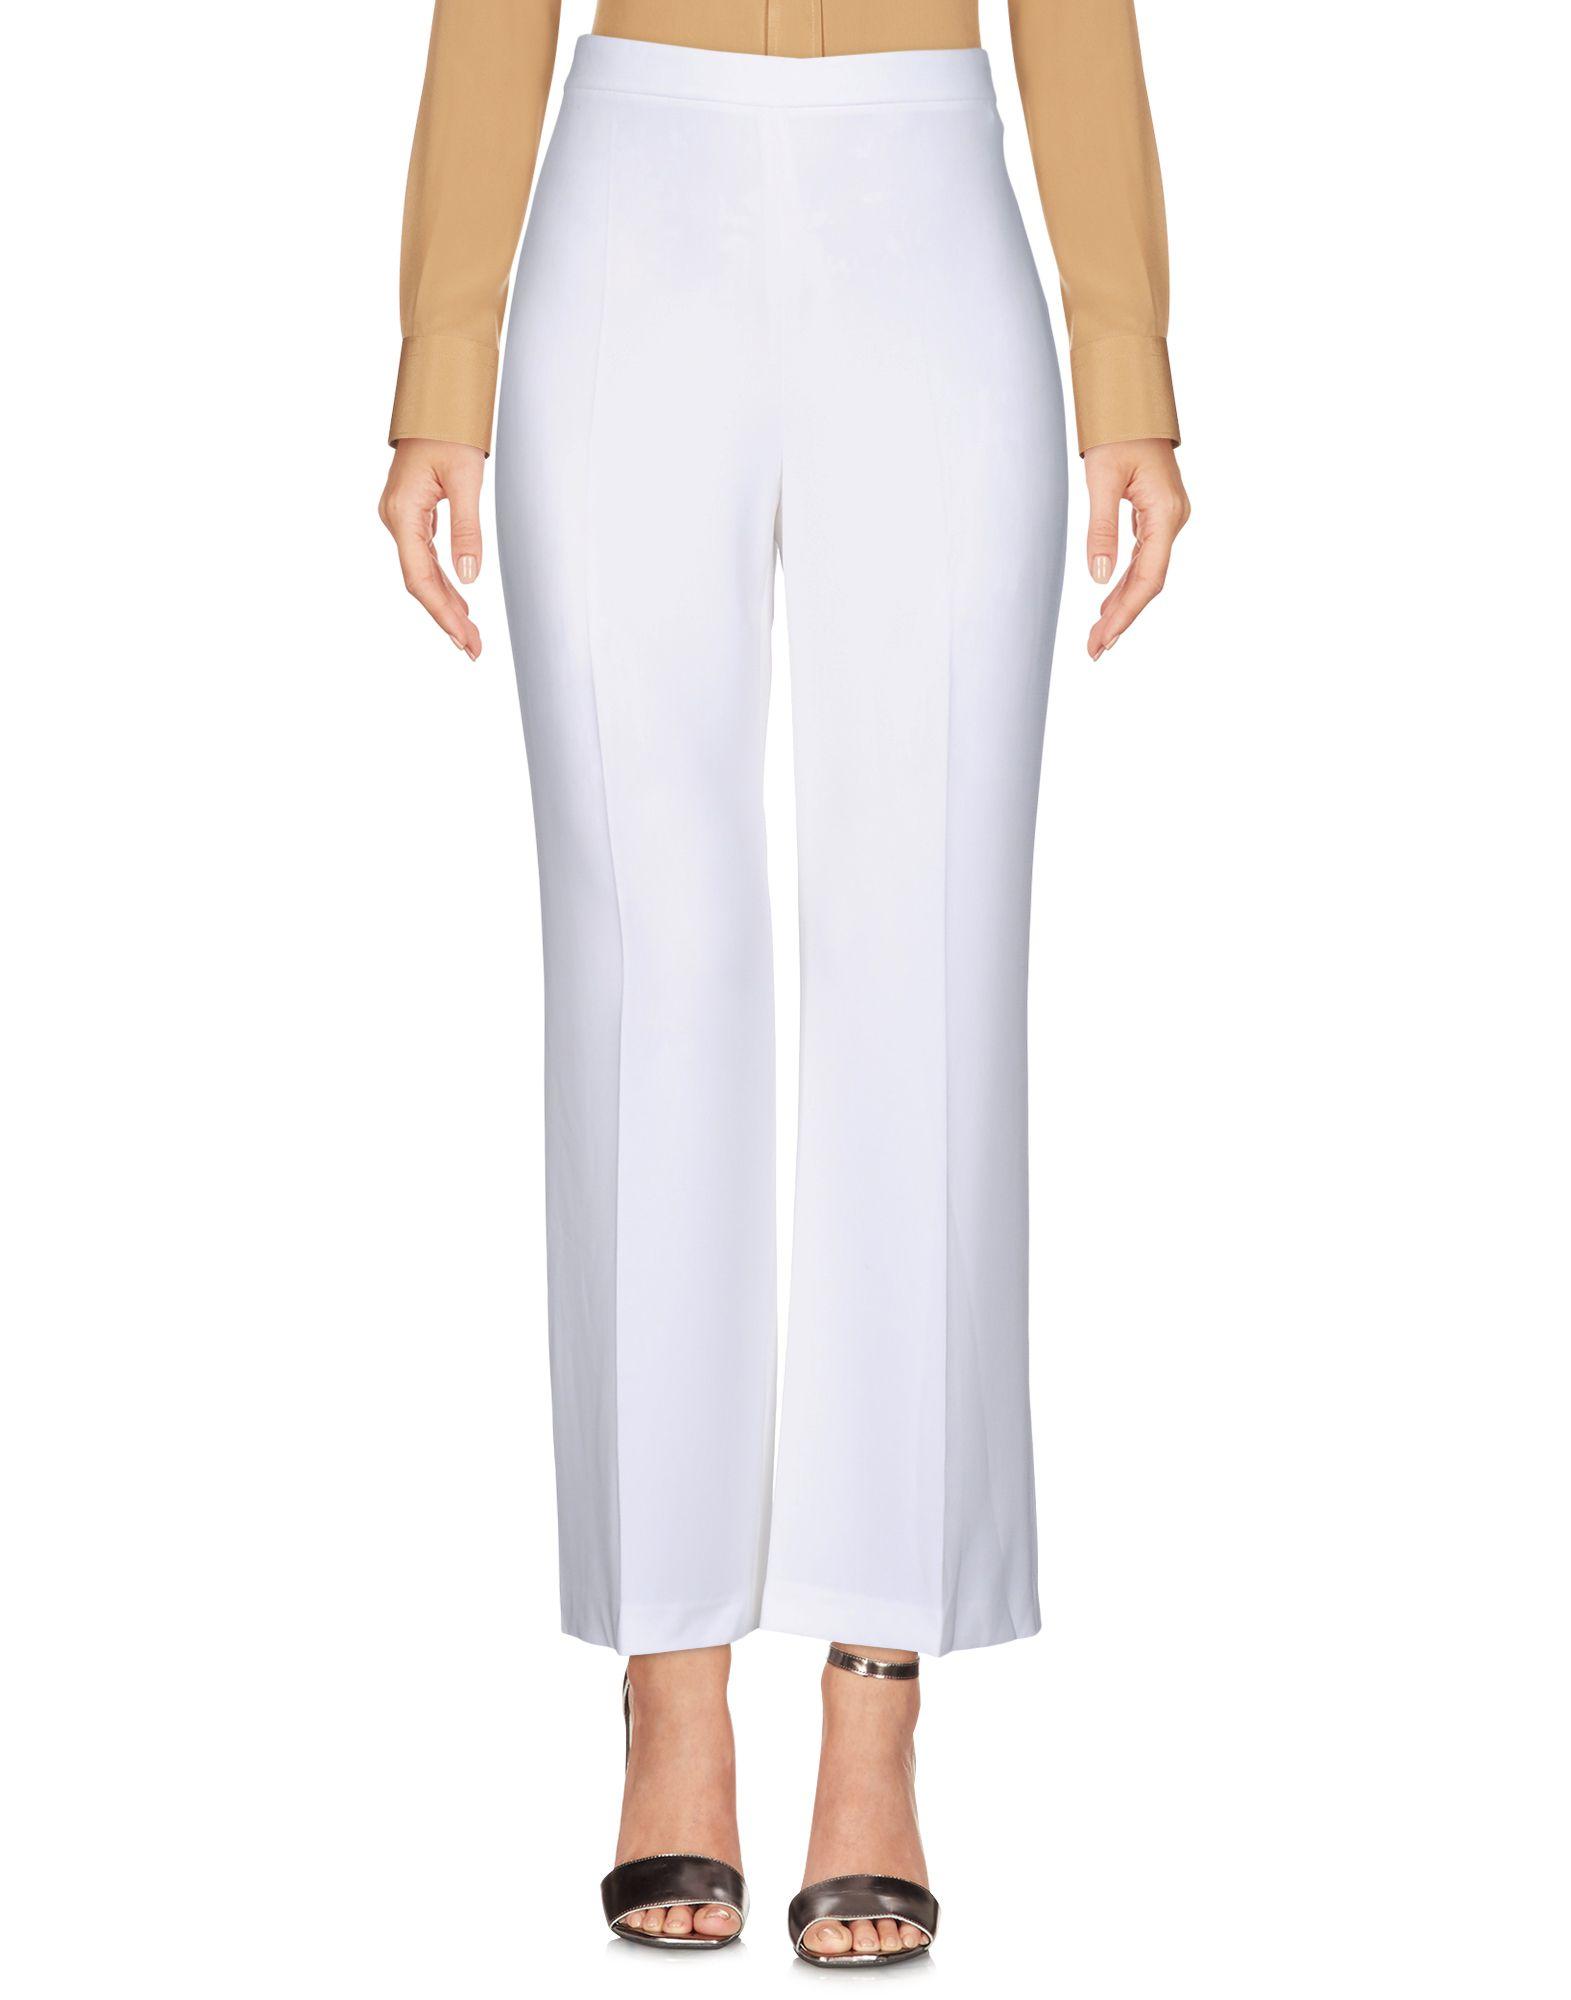 Pantalone Theory Donna - Acquista online su RAVoHh